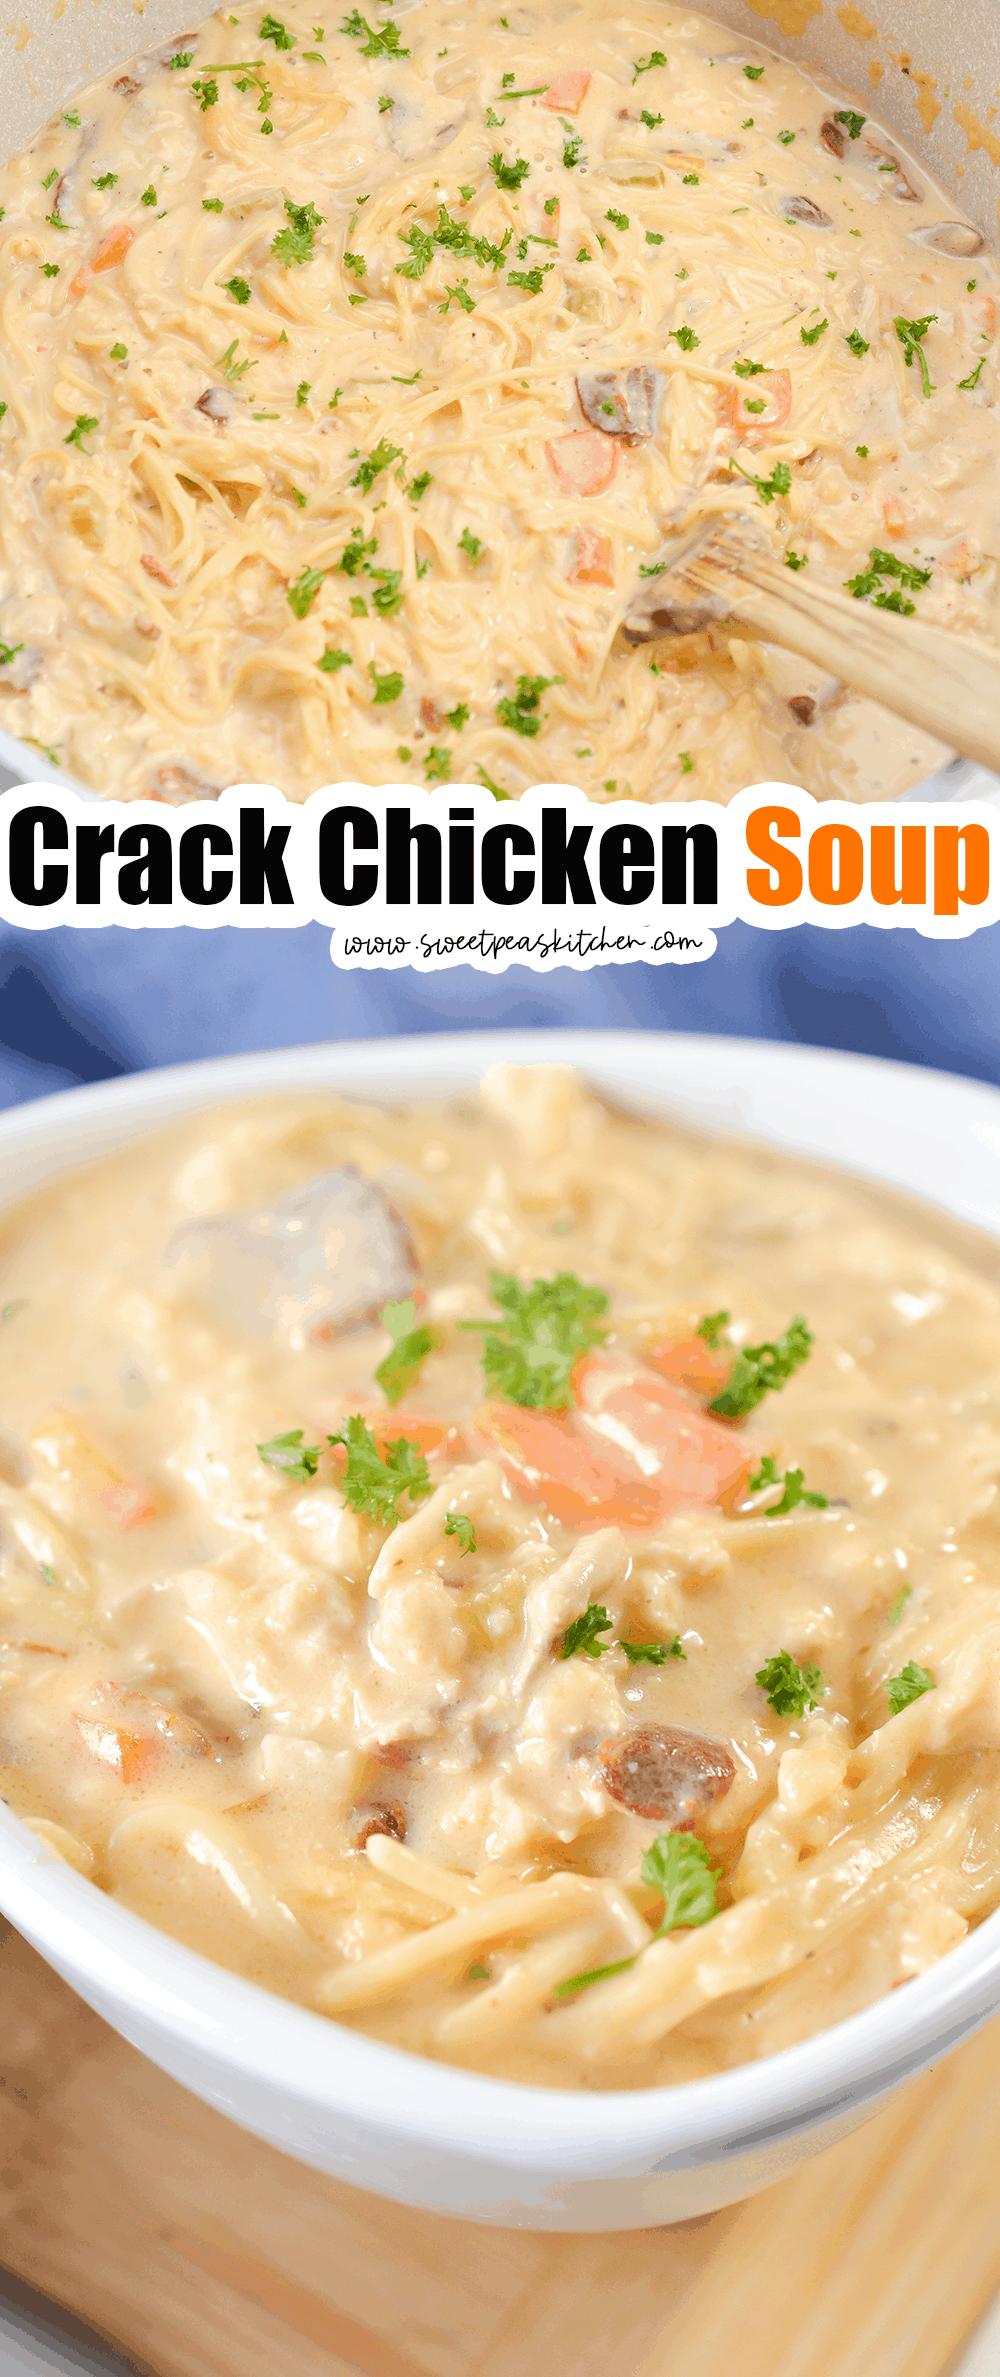 Crack Chicken Soup